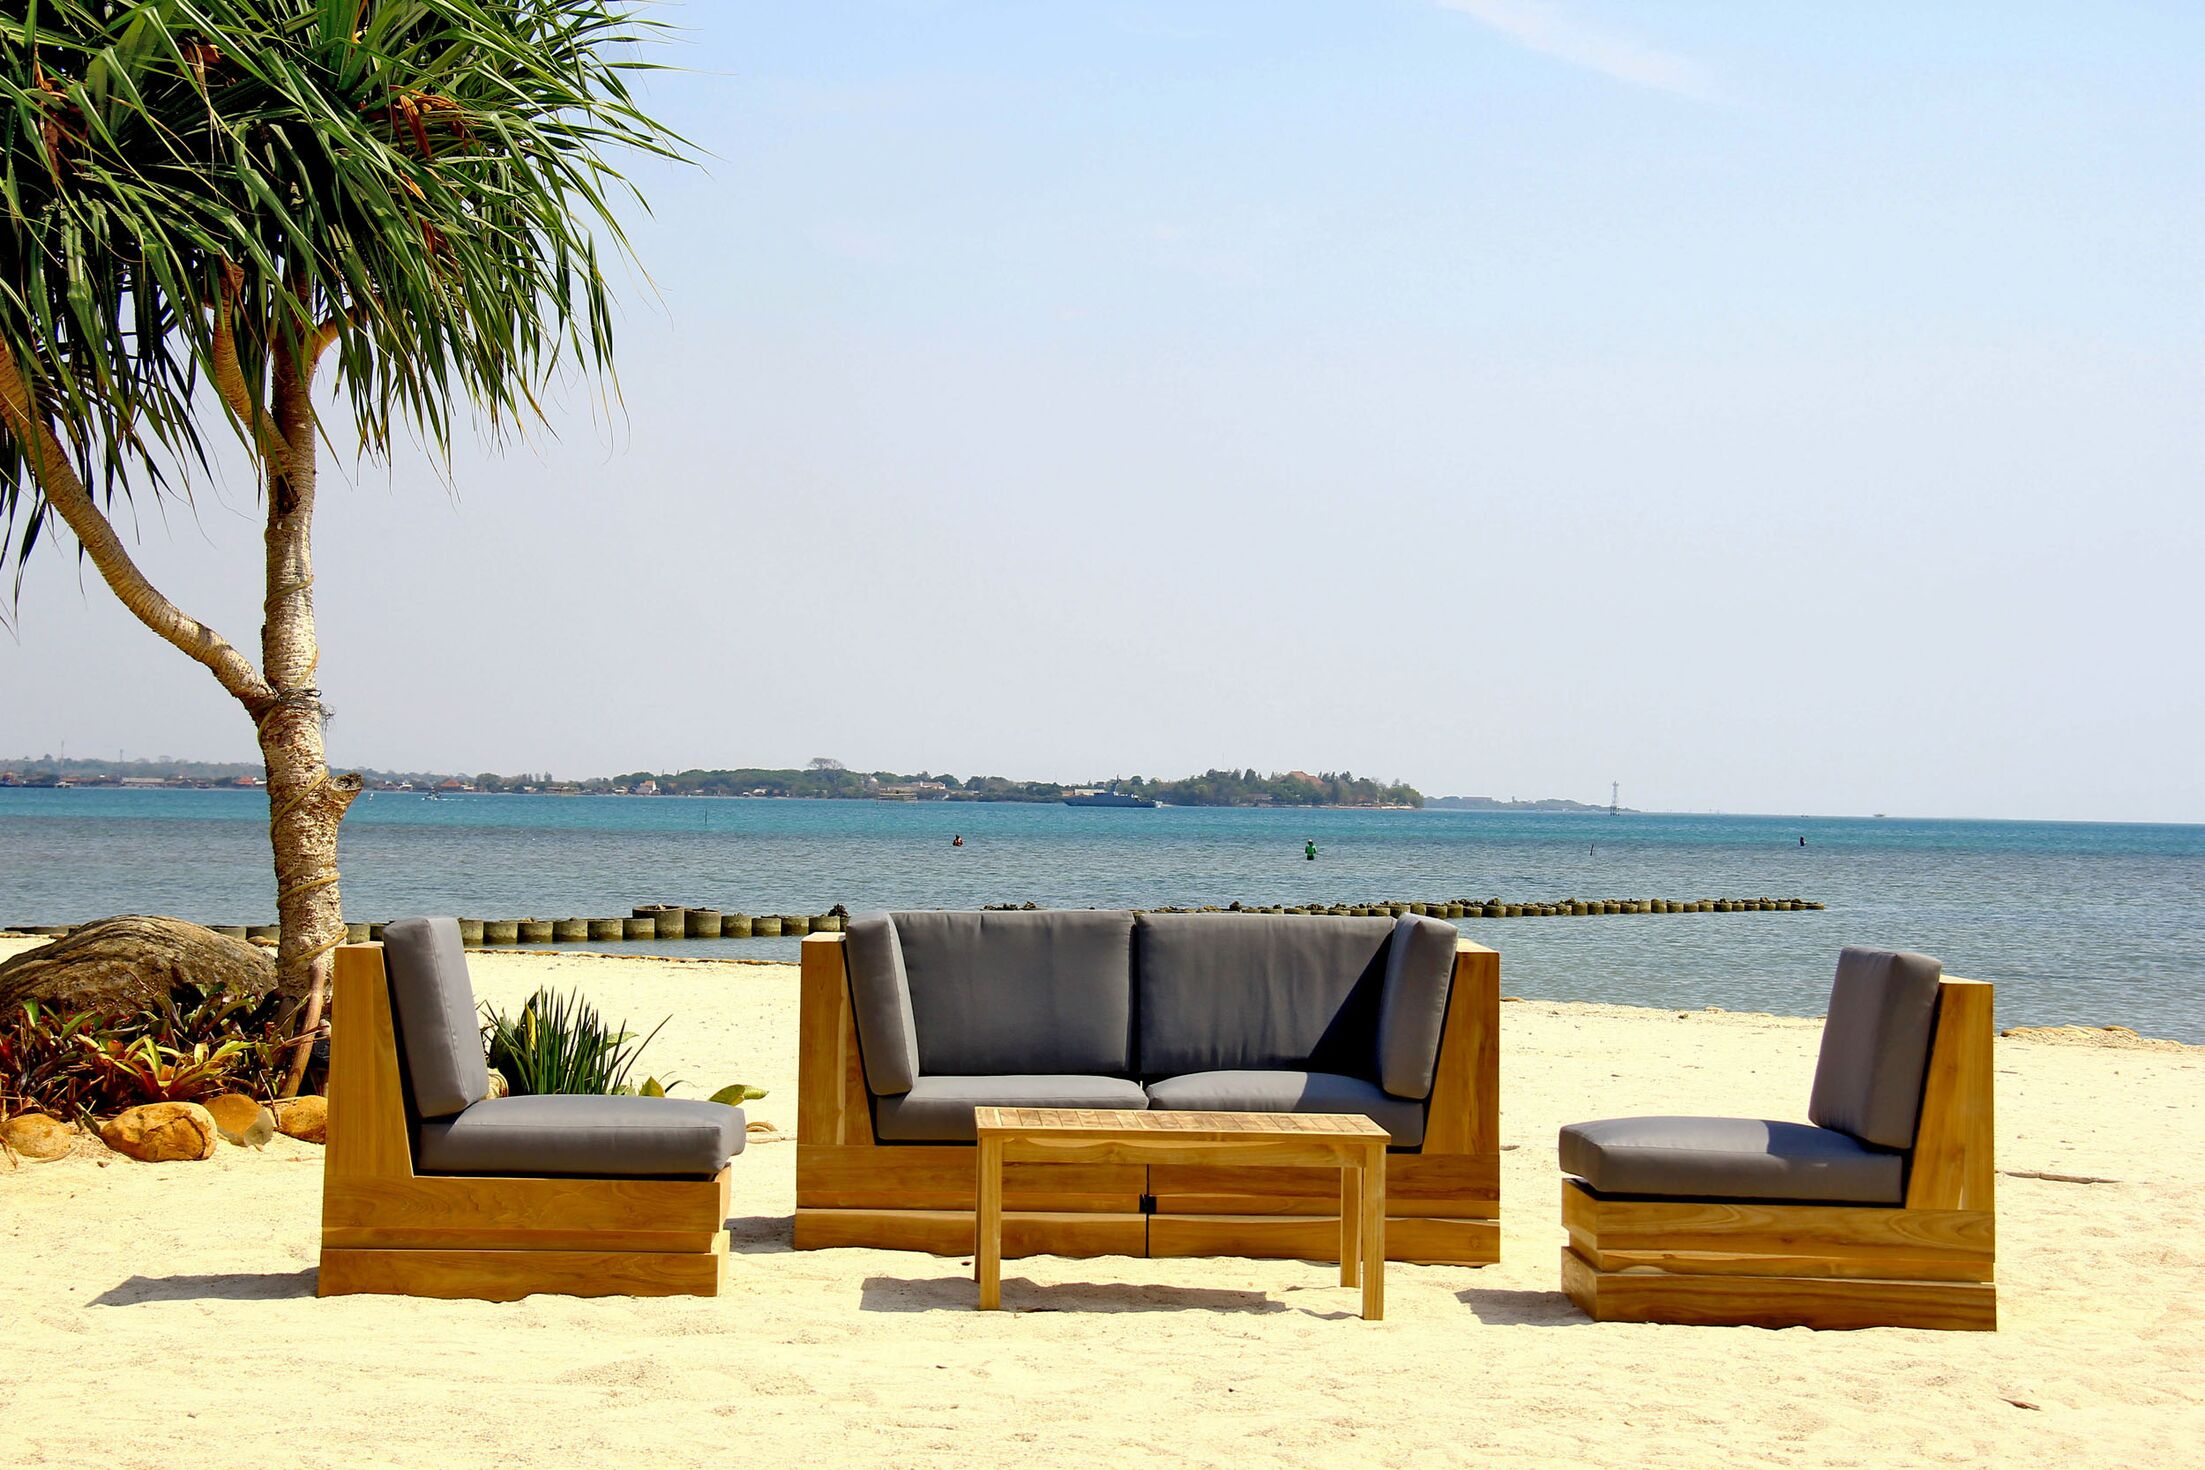 Seaside 5 Piece Teak Sunbrella Sofa Set with Cushions Fabric: Ginko